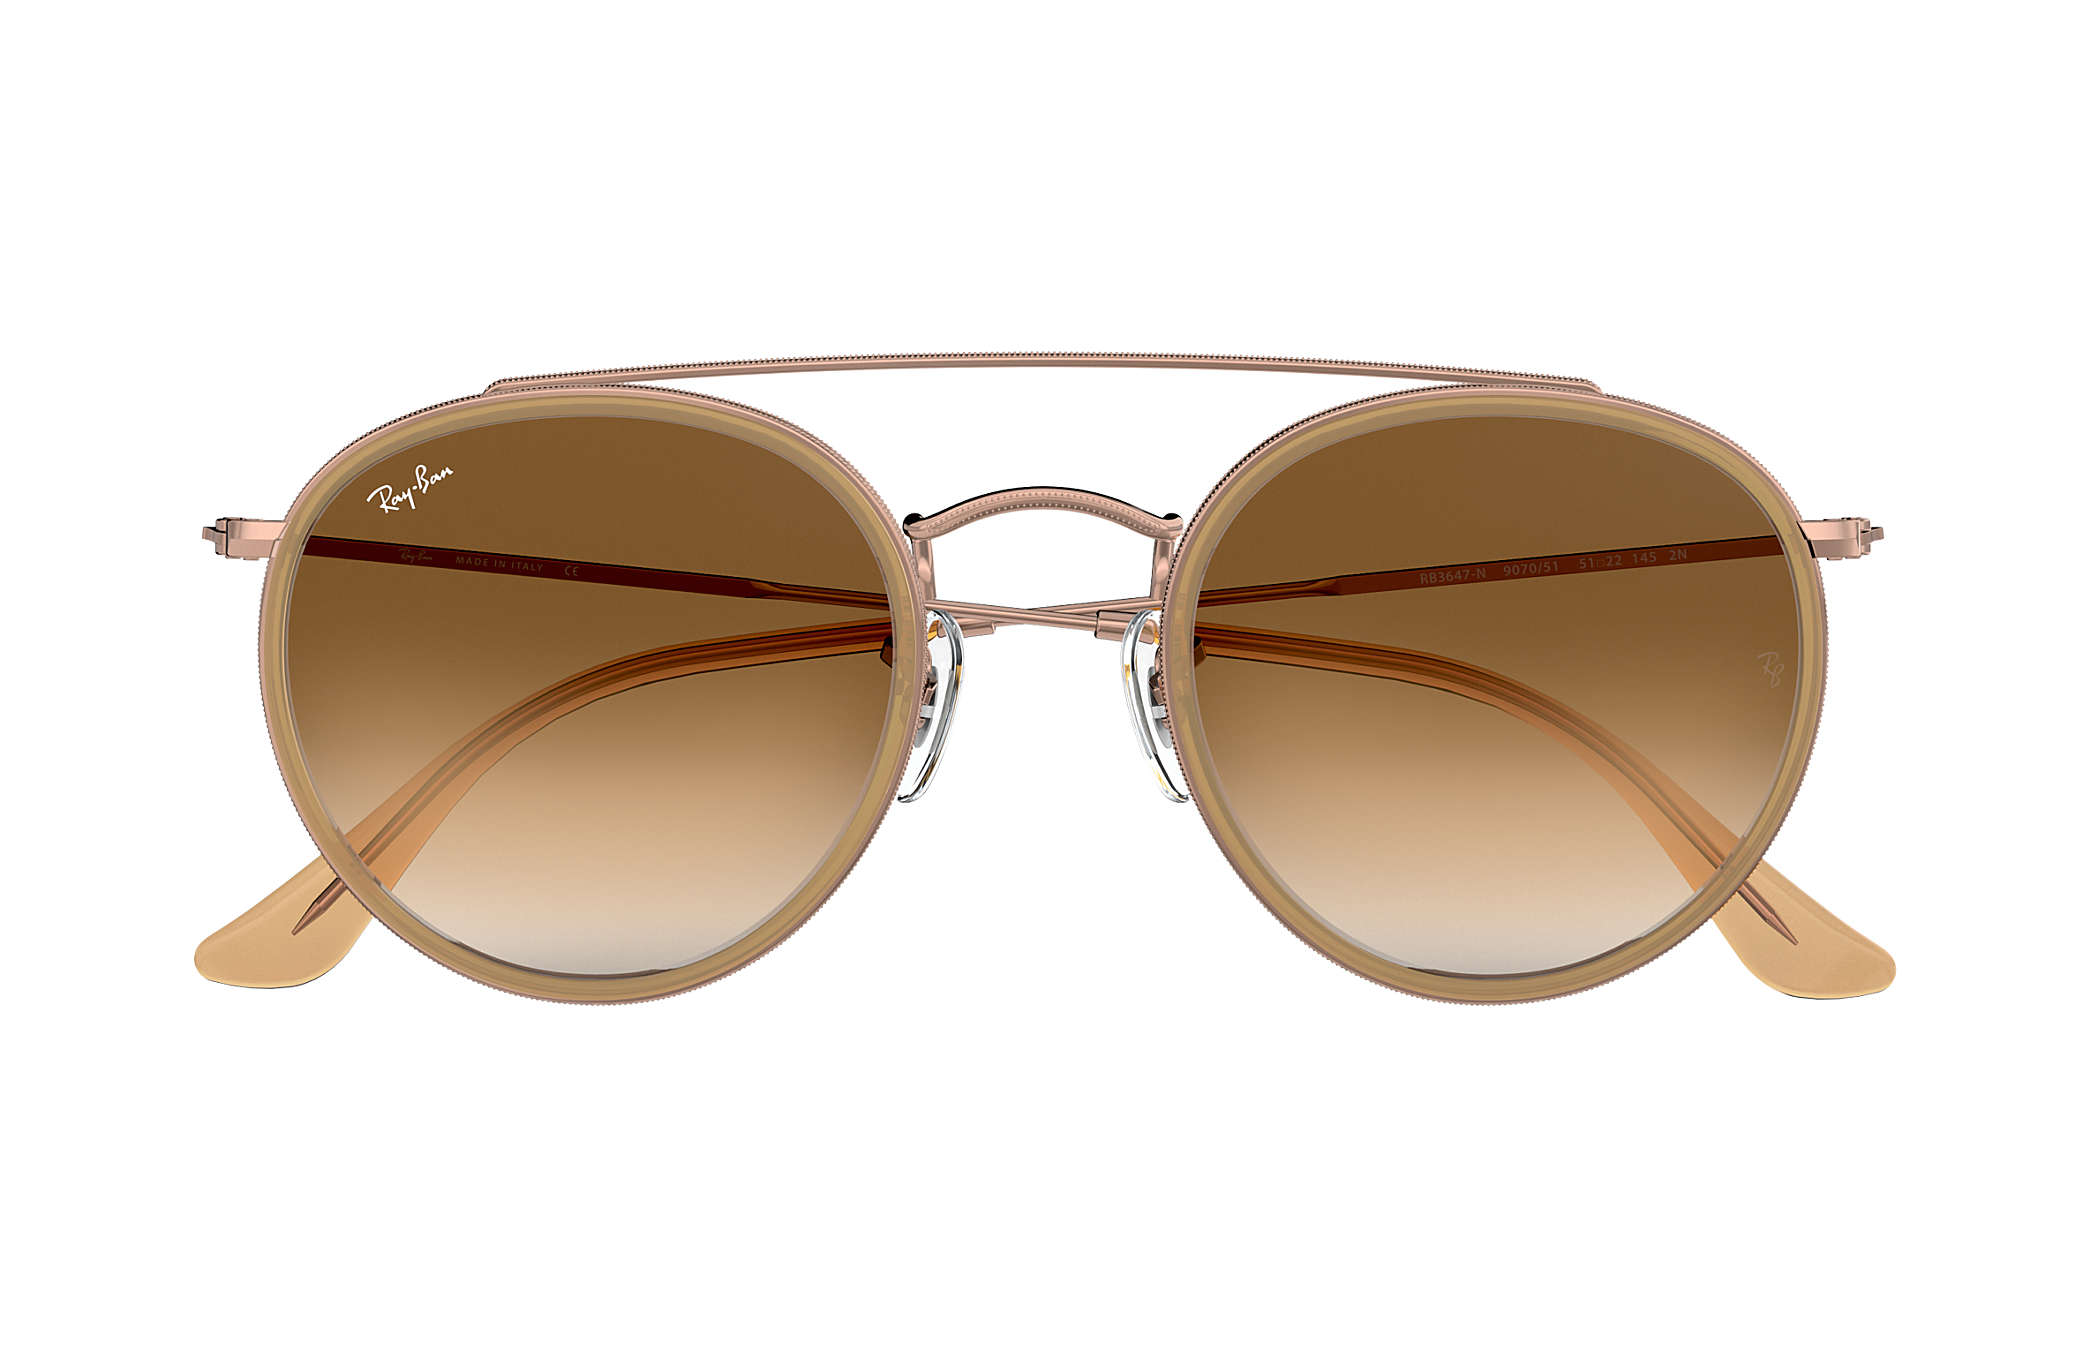 ea140bb352 ... Ray-Ban 0RB3647N-ROUND DOUBLE BRIDGE Light Brown  Bronze-Copper SUN ...